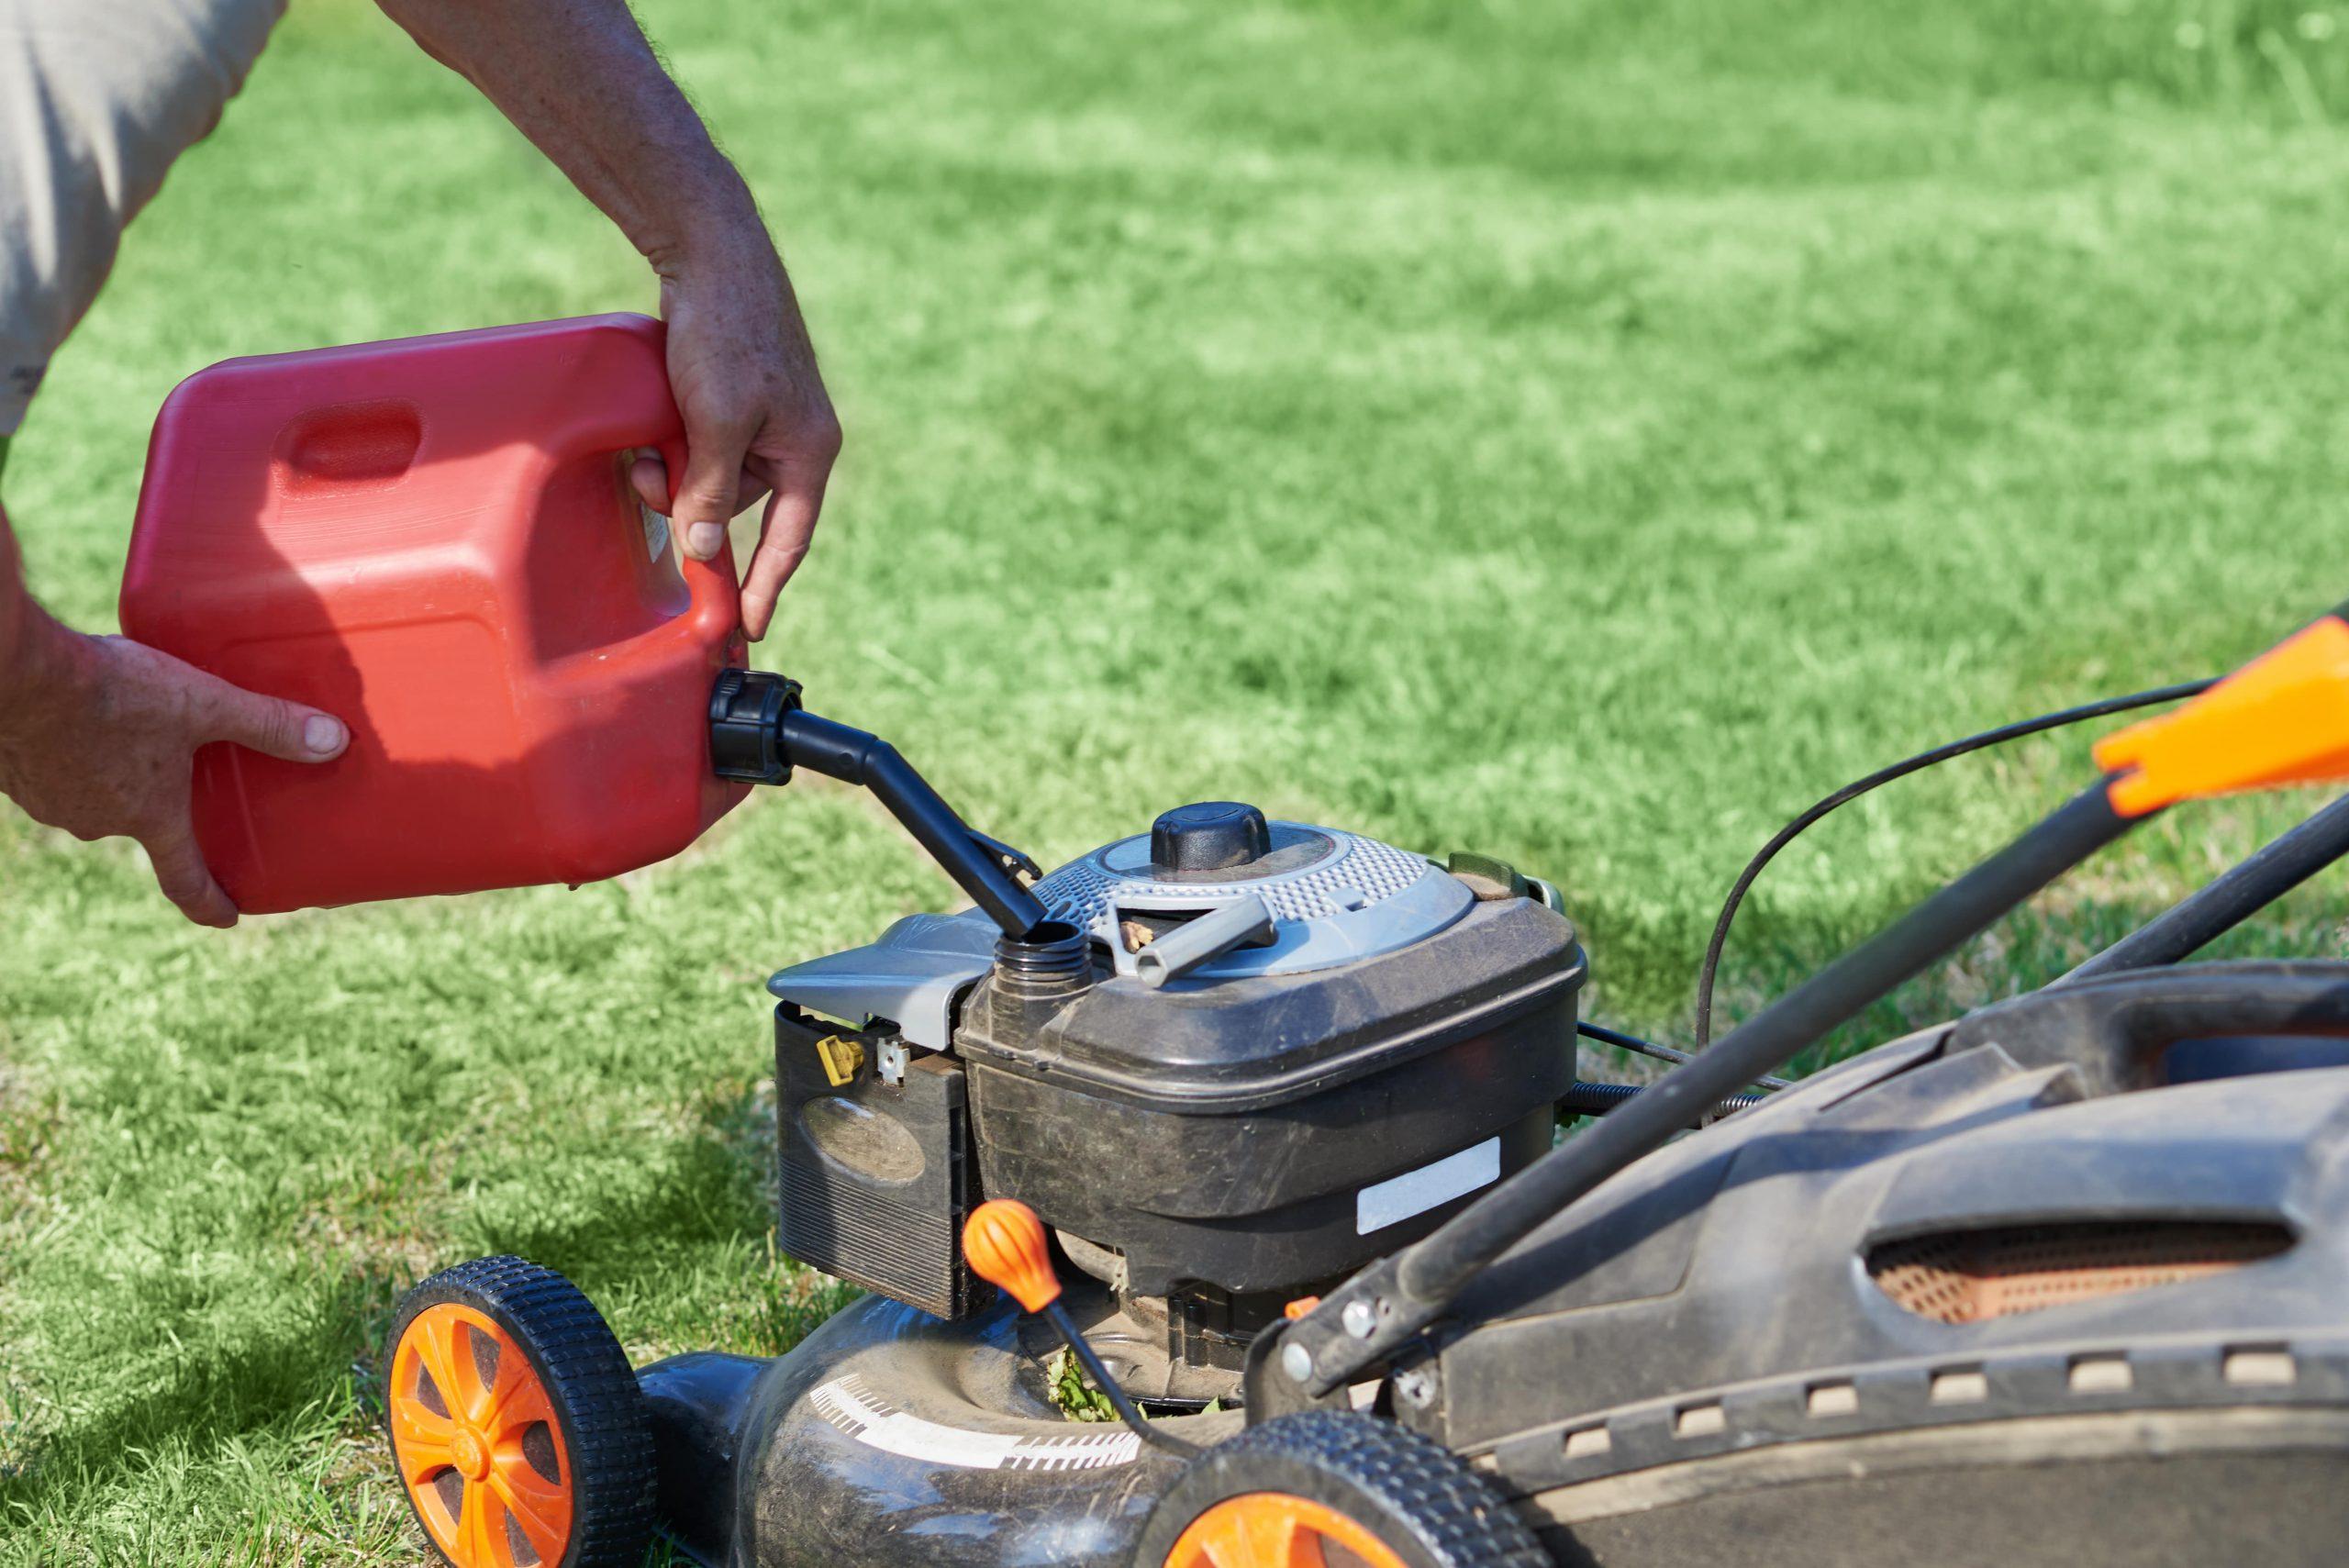 Man refueling lawn mower.